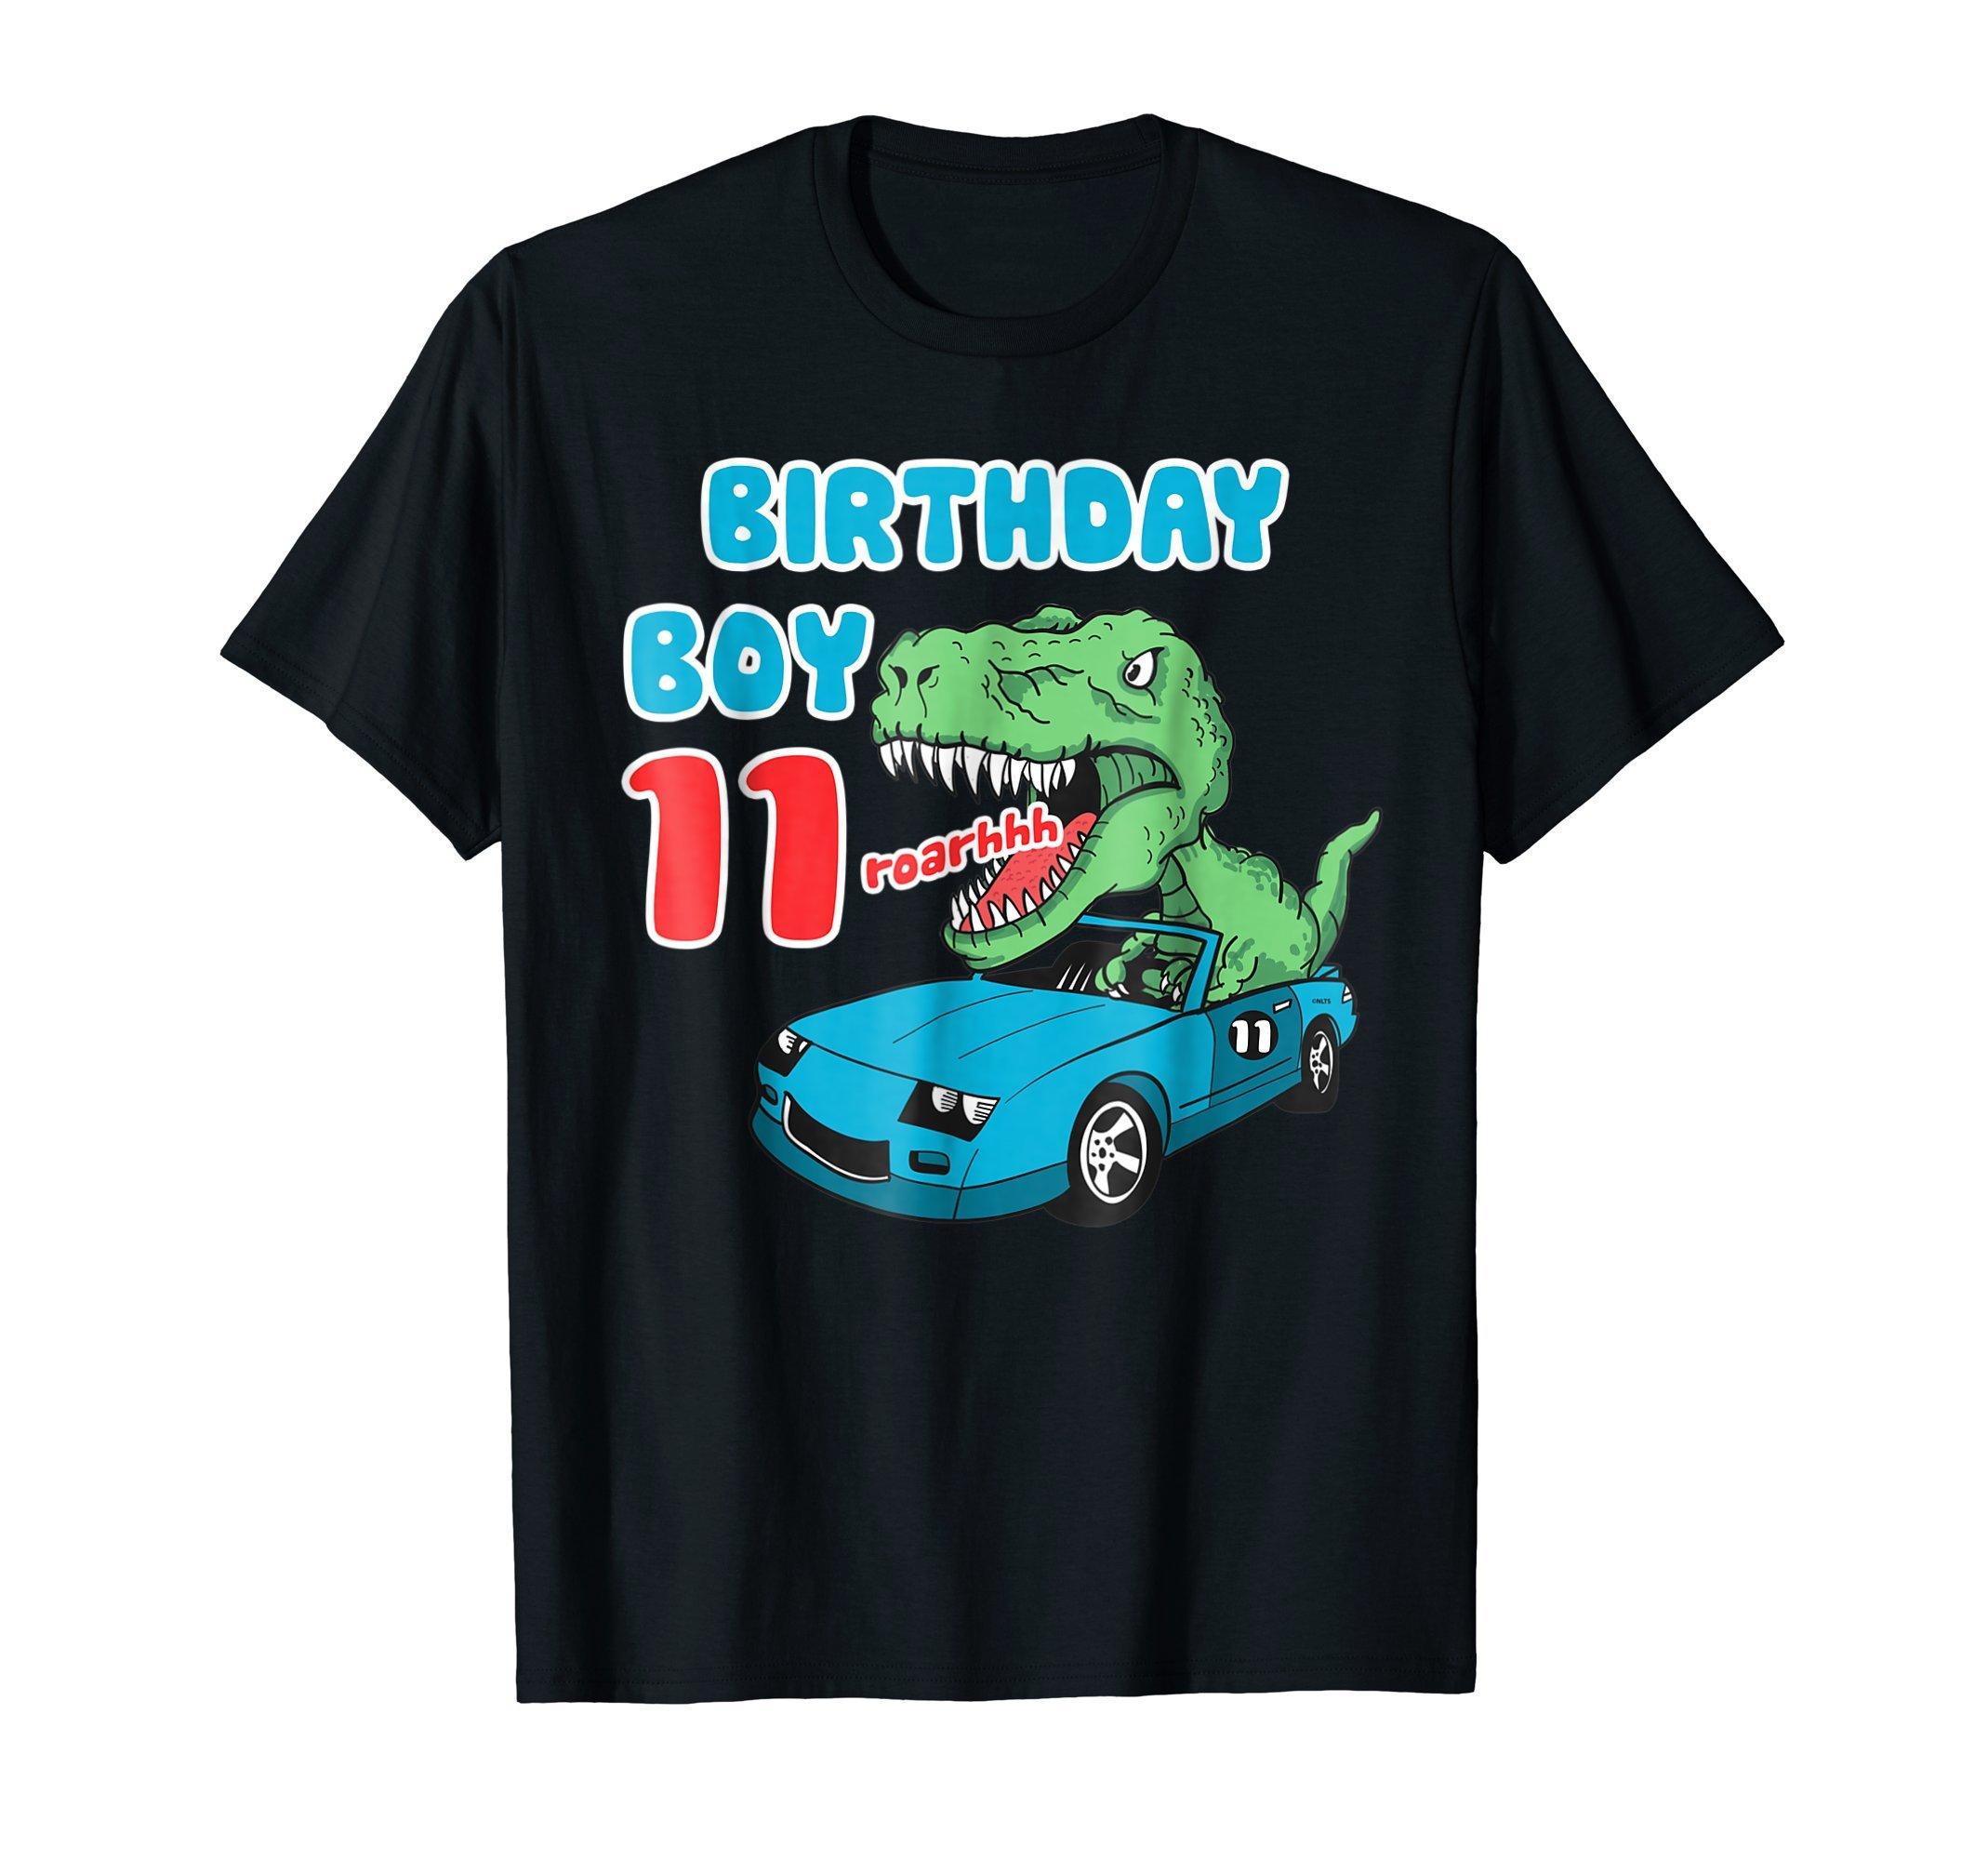 Dinosaur-Racer-Birthday-Boy-11th-Birthday-Fun-Humor-T-Shirt